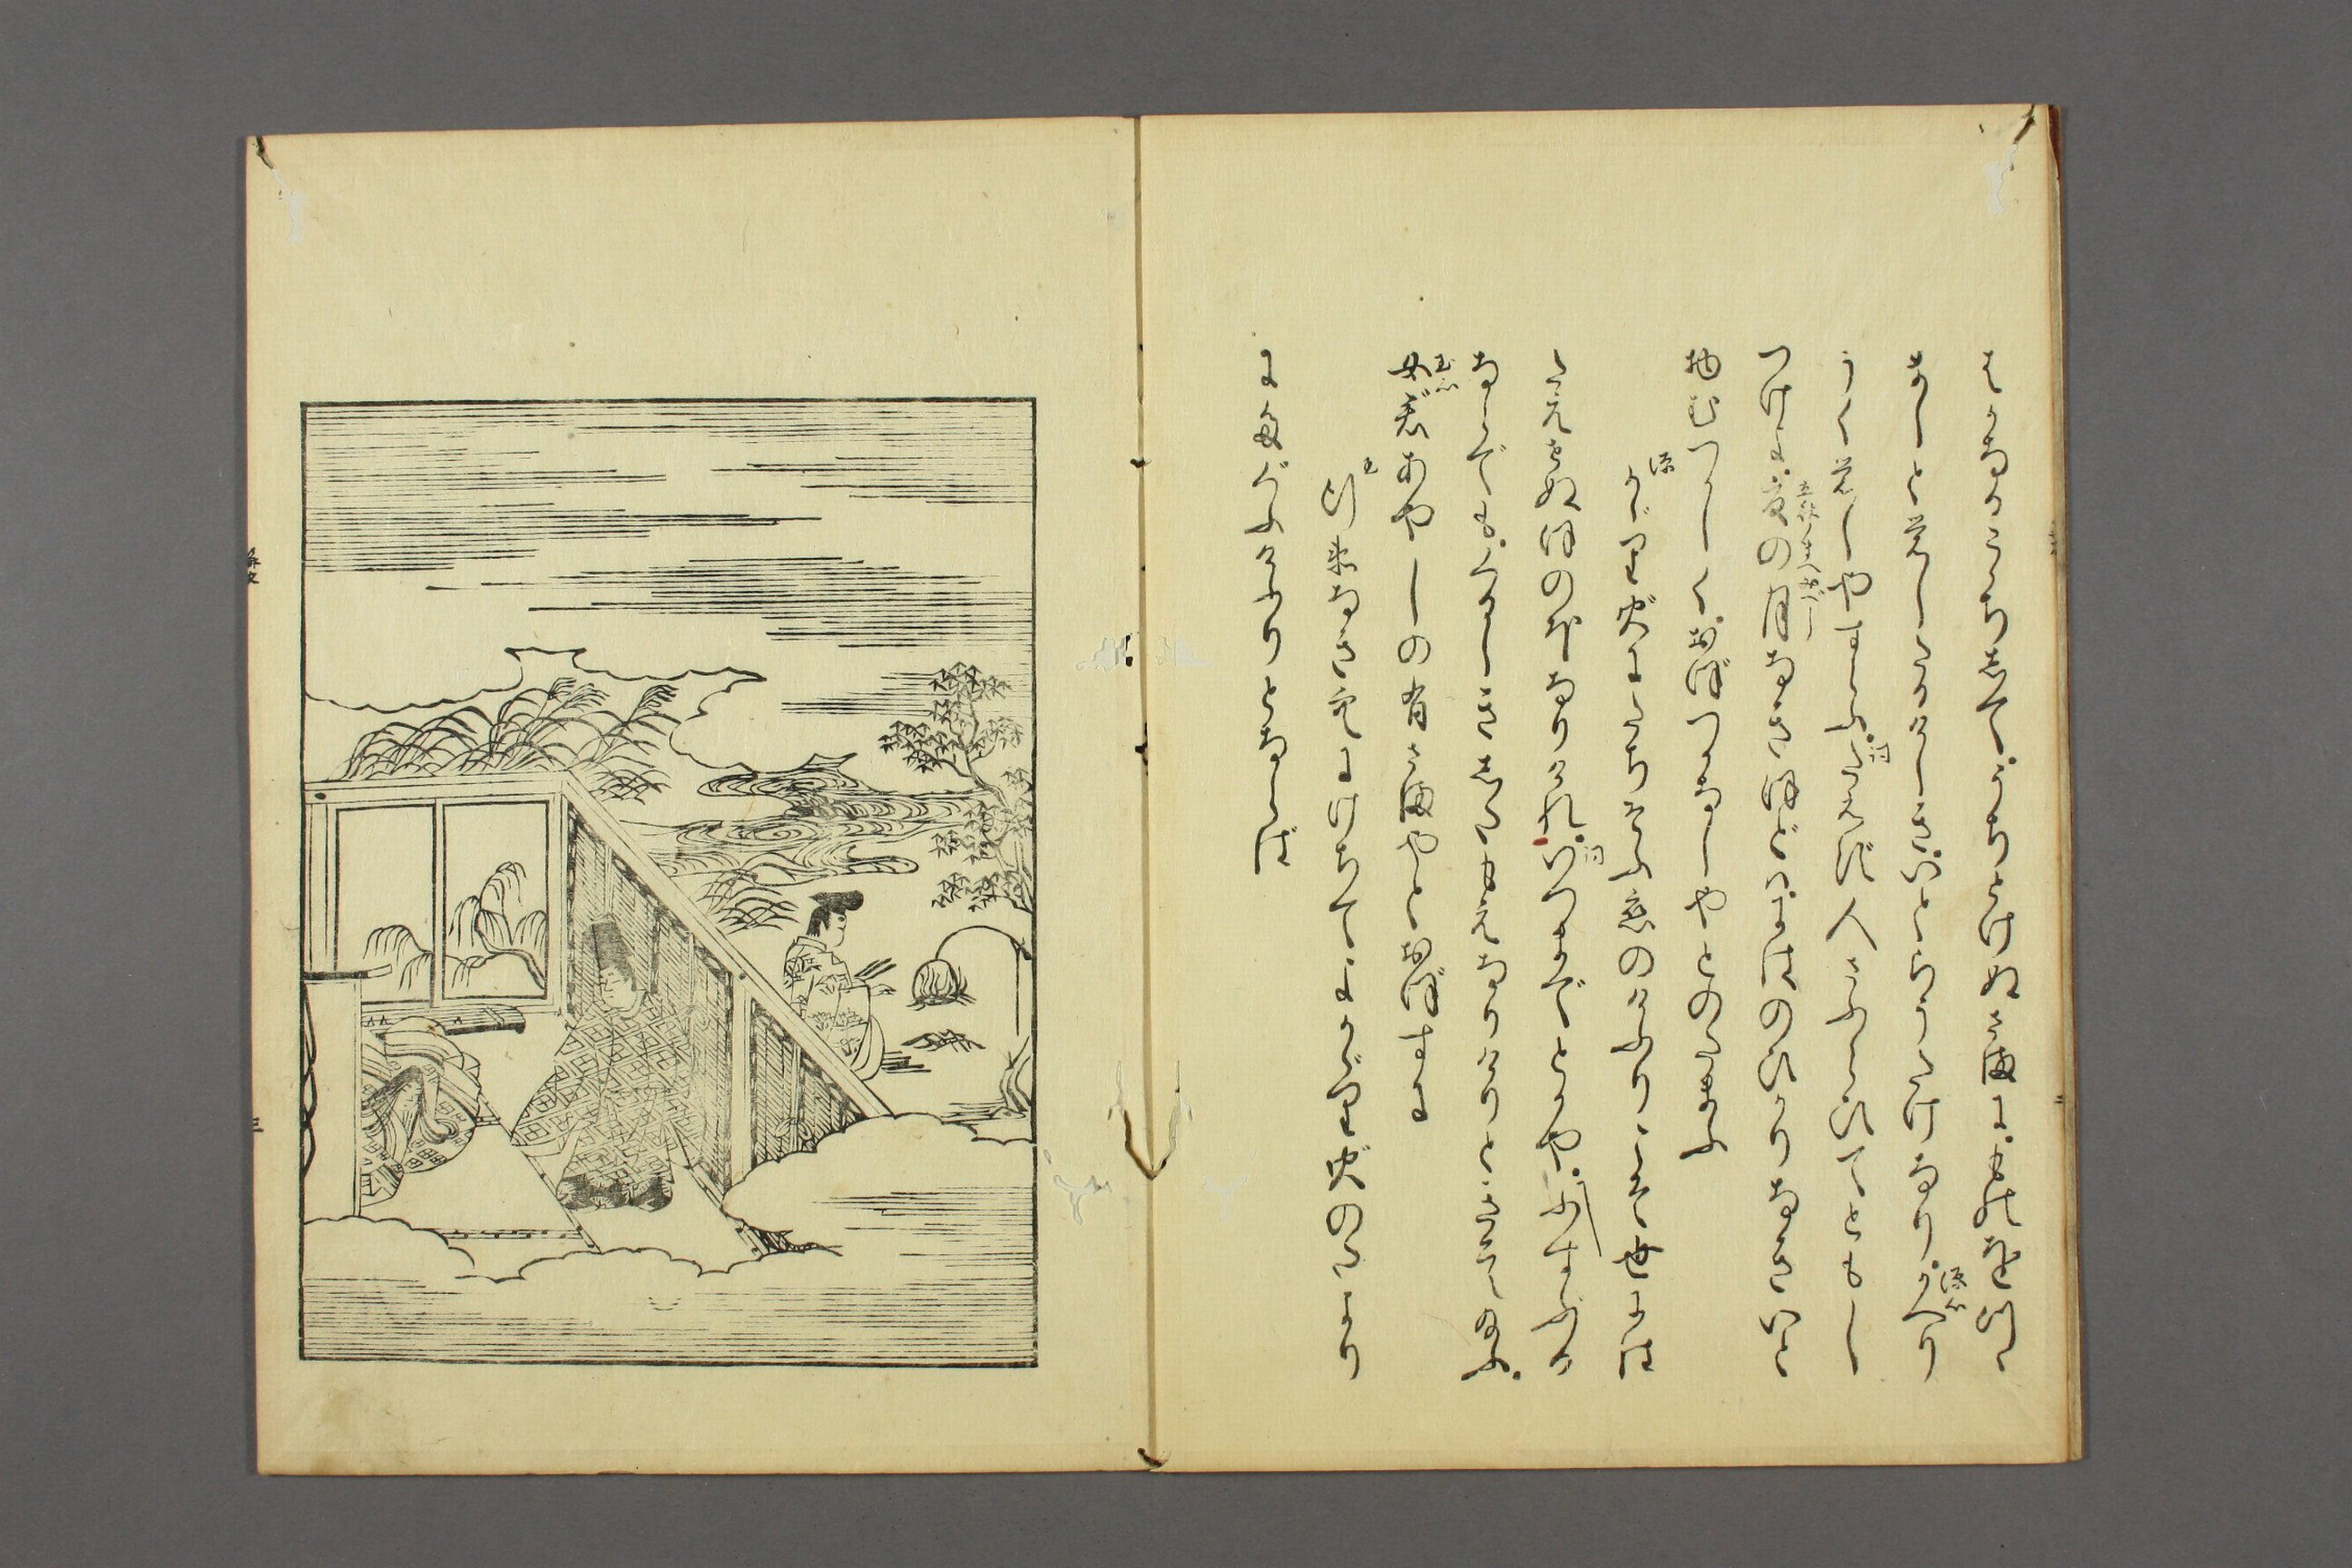 http://archive.wul.waseda.ac.jp/kosho/bunko30/bunko30_a0007/bunko30_a0007_0027/bunko30_a0007_0027_p0004.jpg